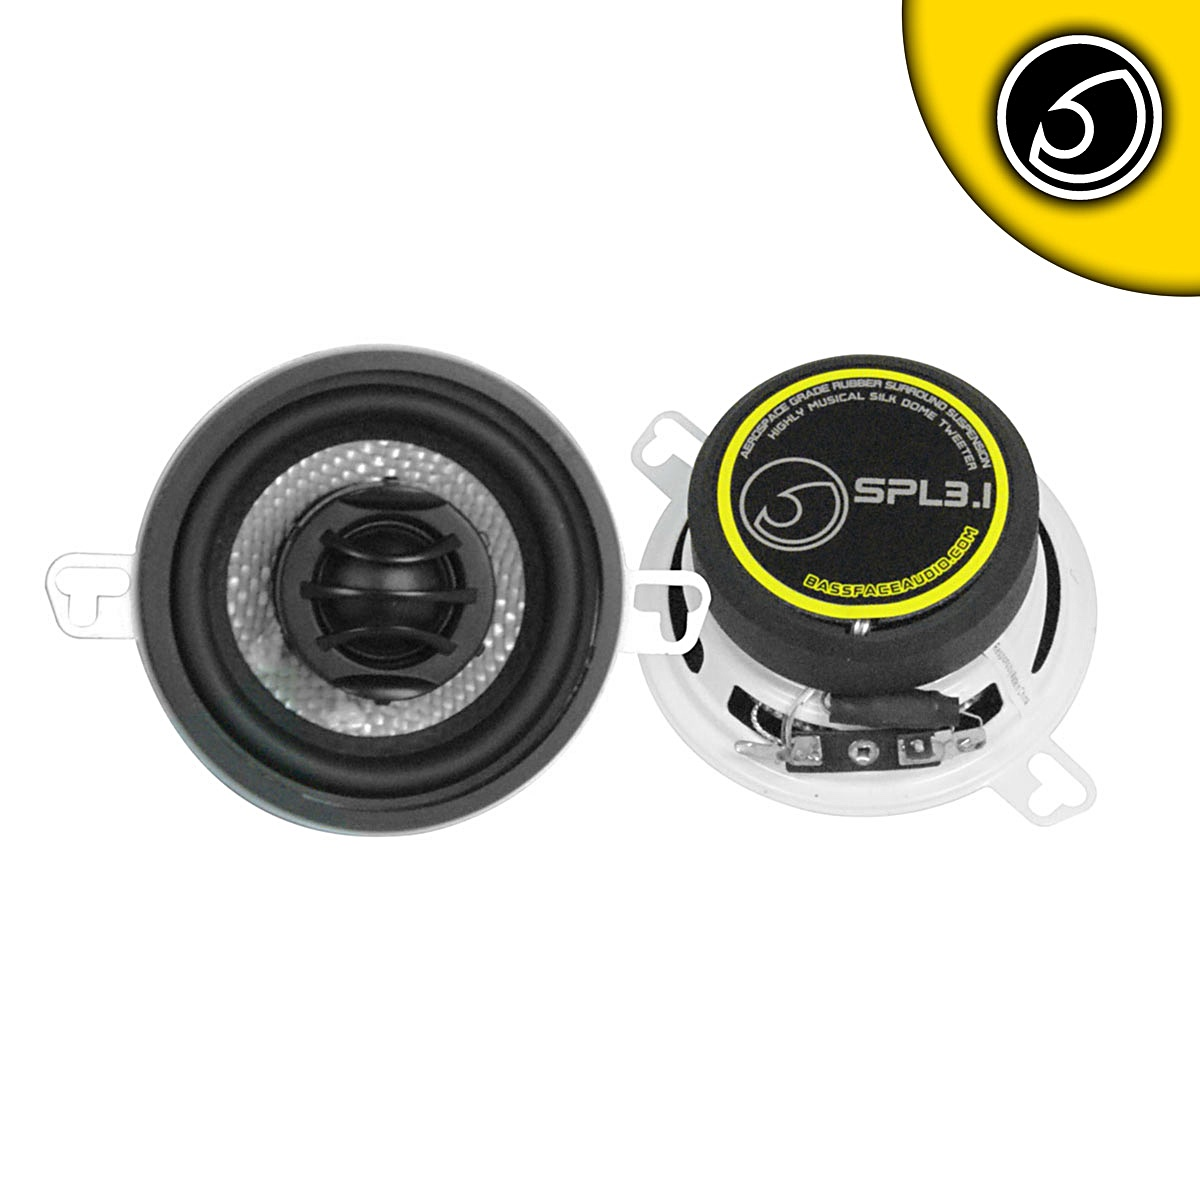 "Bassface SPL3.1 200w 3.5"" Inch 8cm 4Ohm Coaxial 2 Way Speaker Pair"